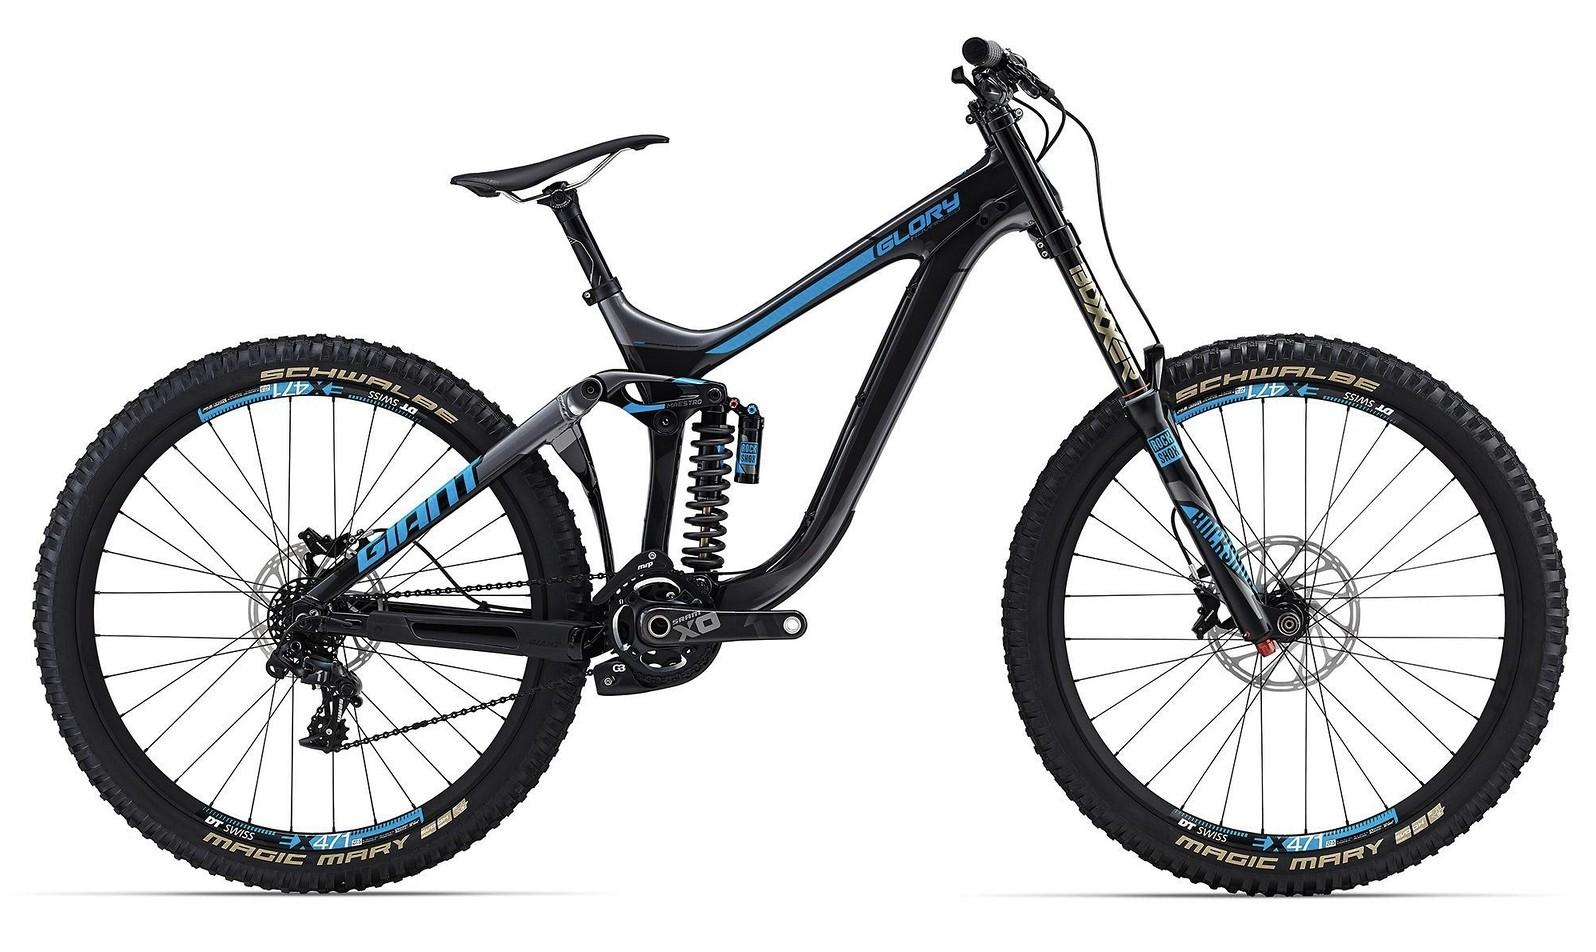 2016 Giant Glory Advanced 27.5 0 Bike 2016 Giant Glory Advanced 27.5 0